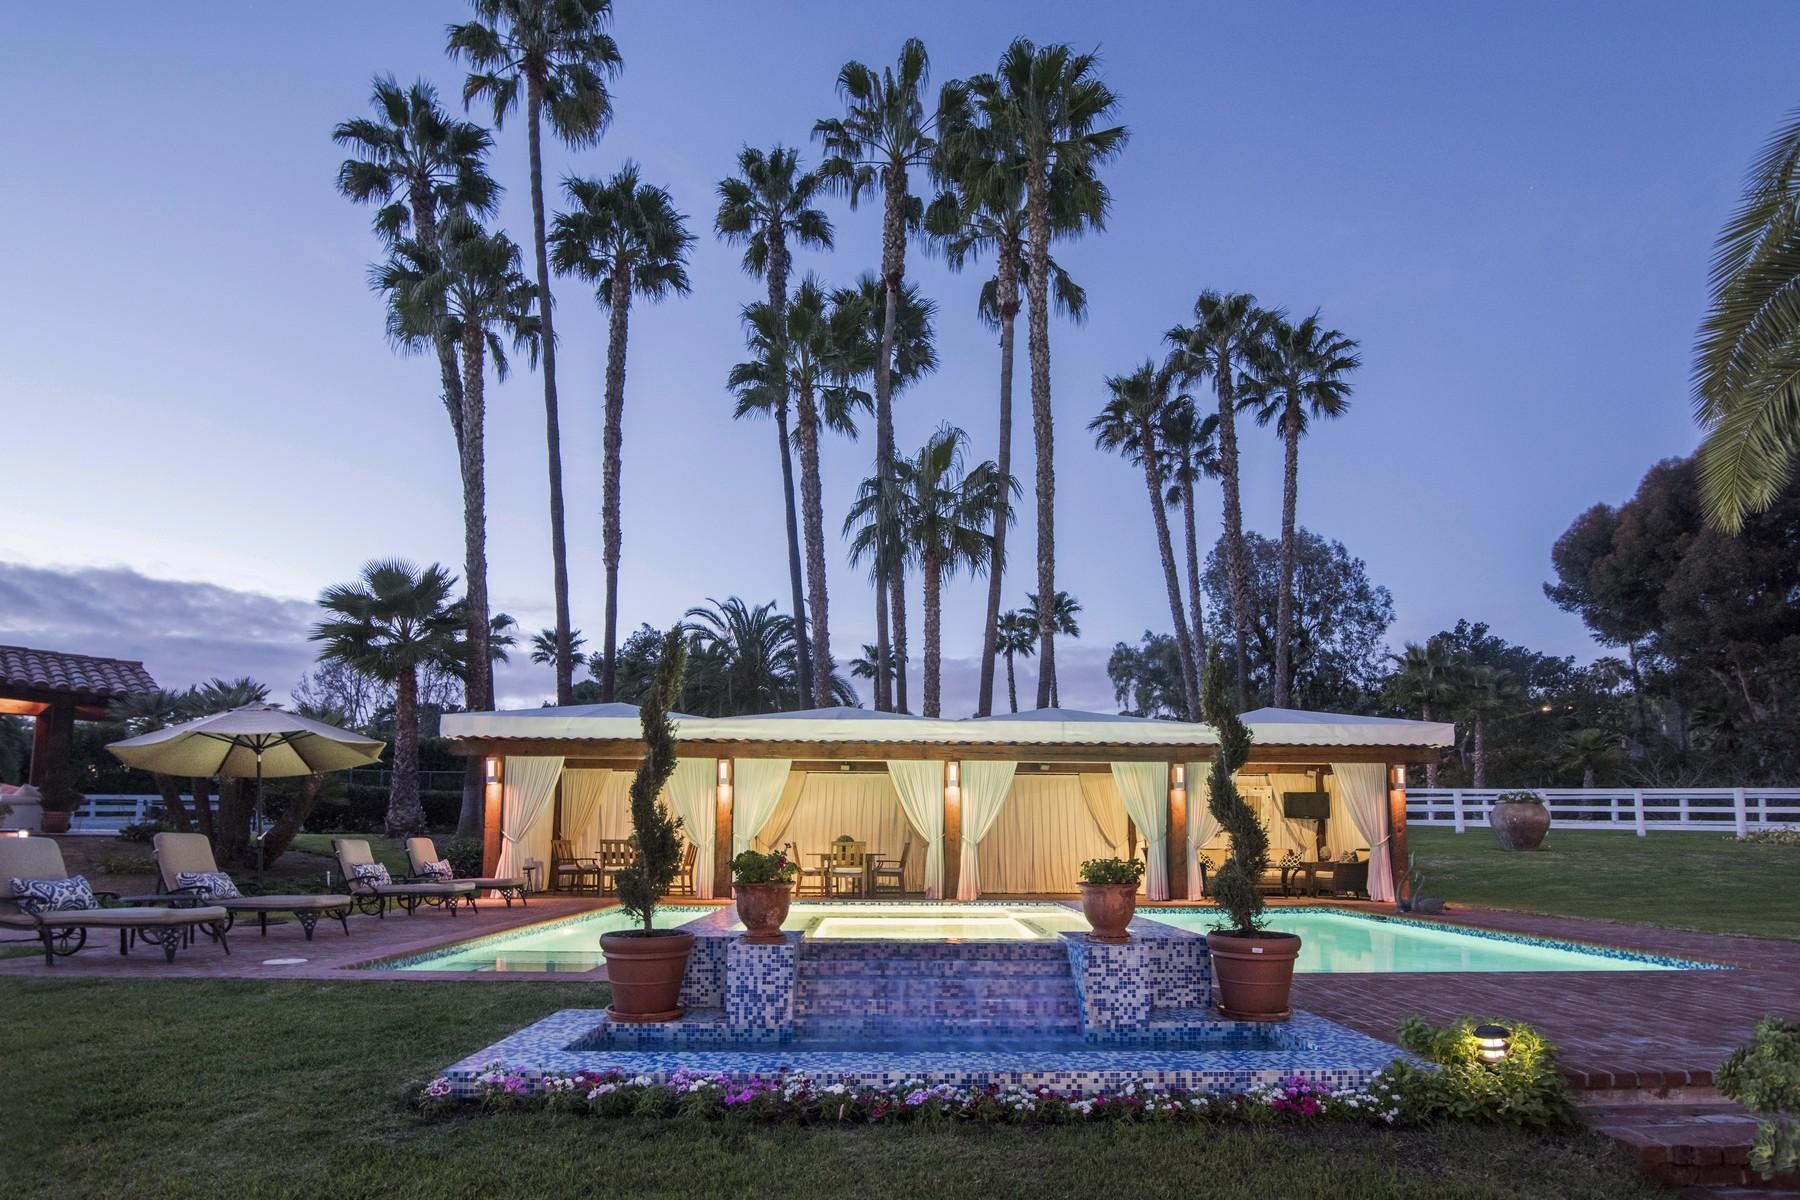 Single Family Home for Sale at 6458 El Sicomoro Rancho Santa Fe, California 92067 United States